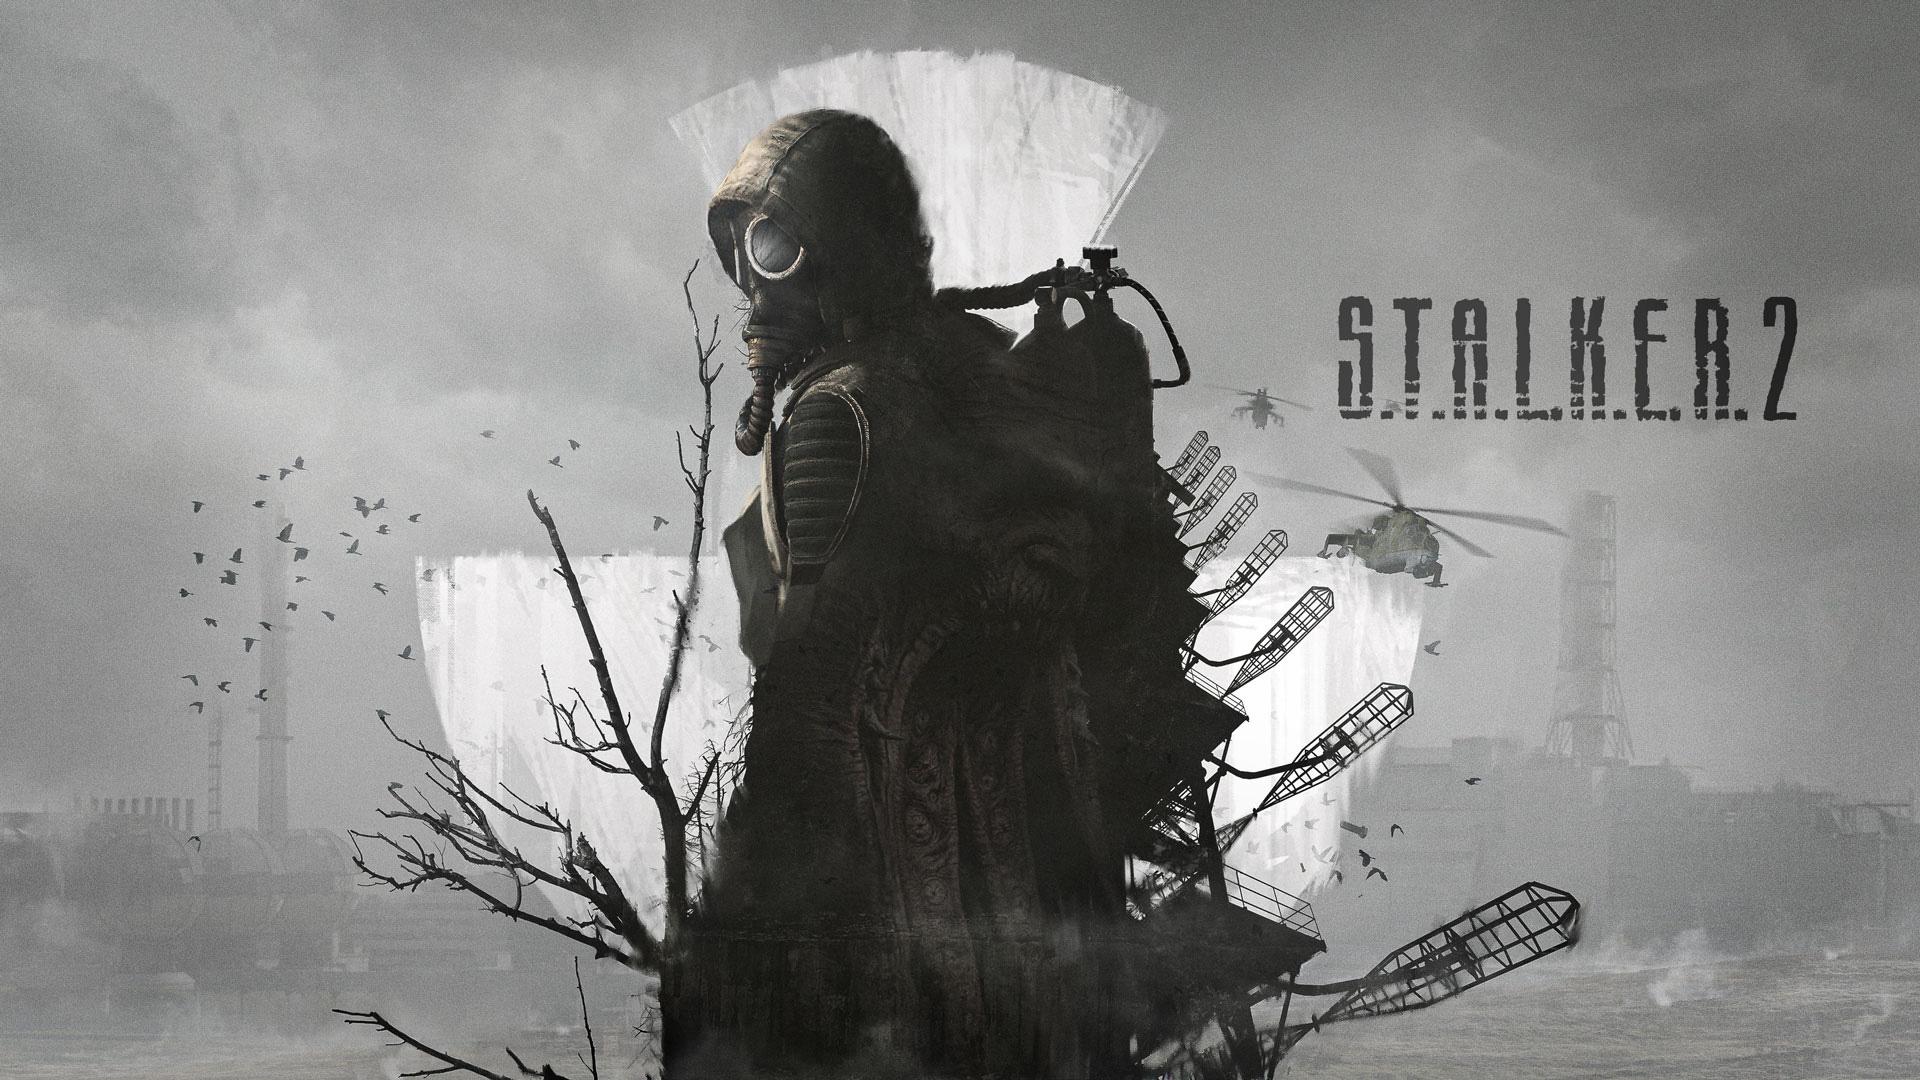 Video For S.T.A.L.K.E.R. 2 is Coming to Xbox Series X